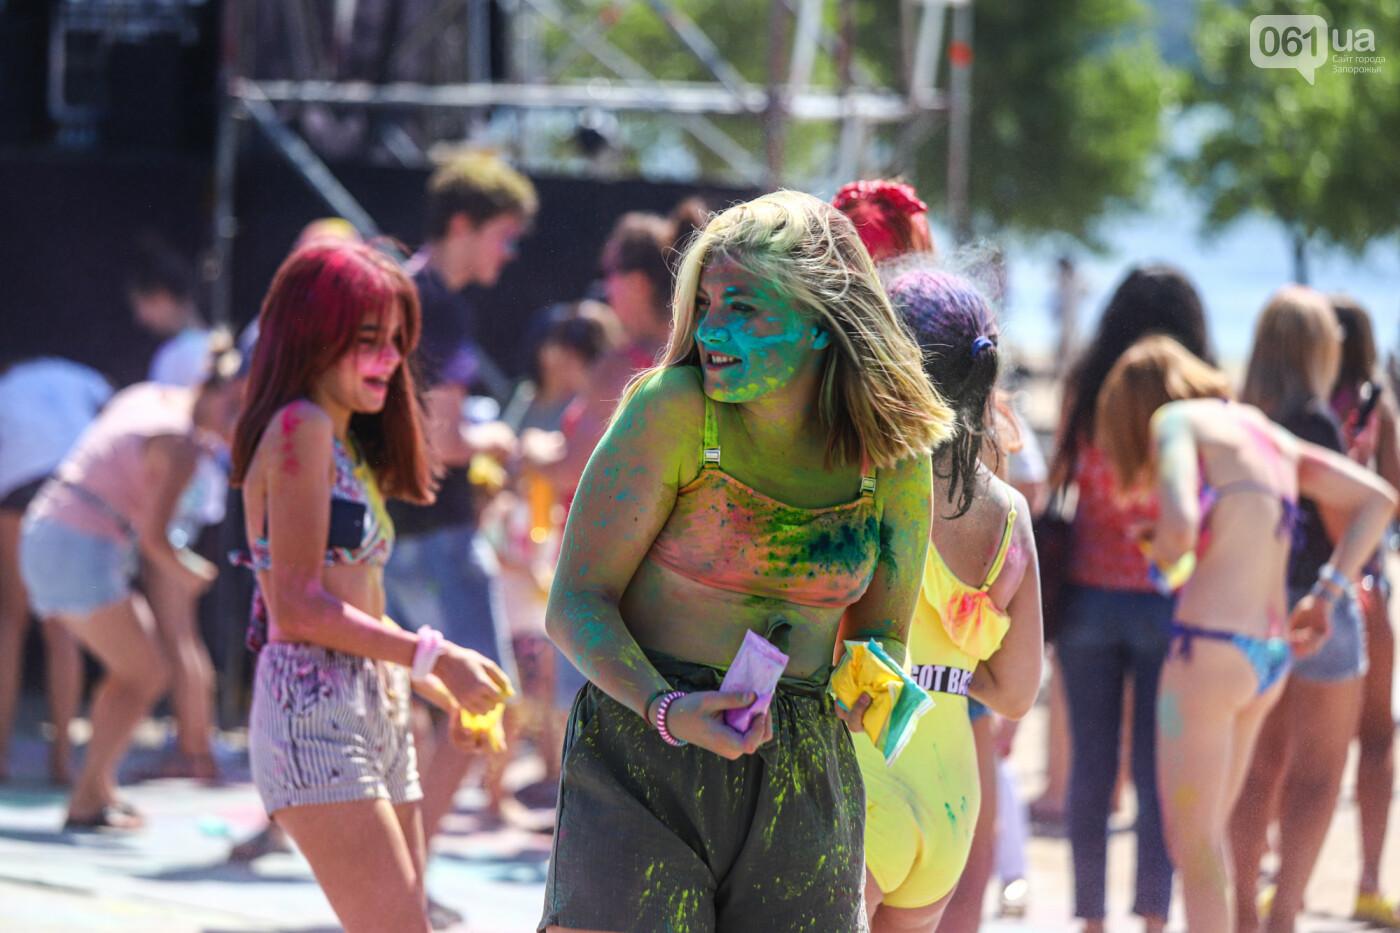 Сотни запорожцев приняли участие в фестивале красок Холи, - ФОТОРЕПОРТАЖ, фото-7